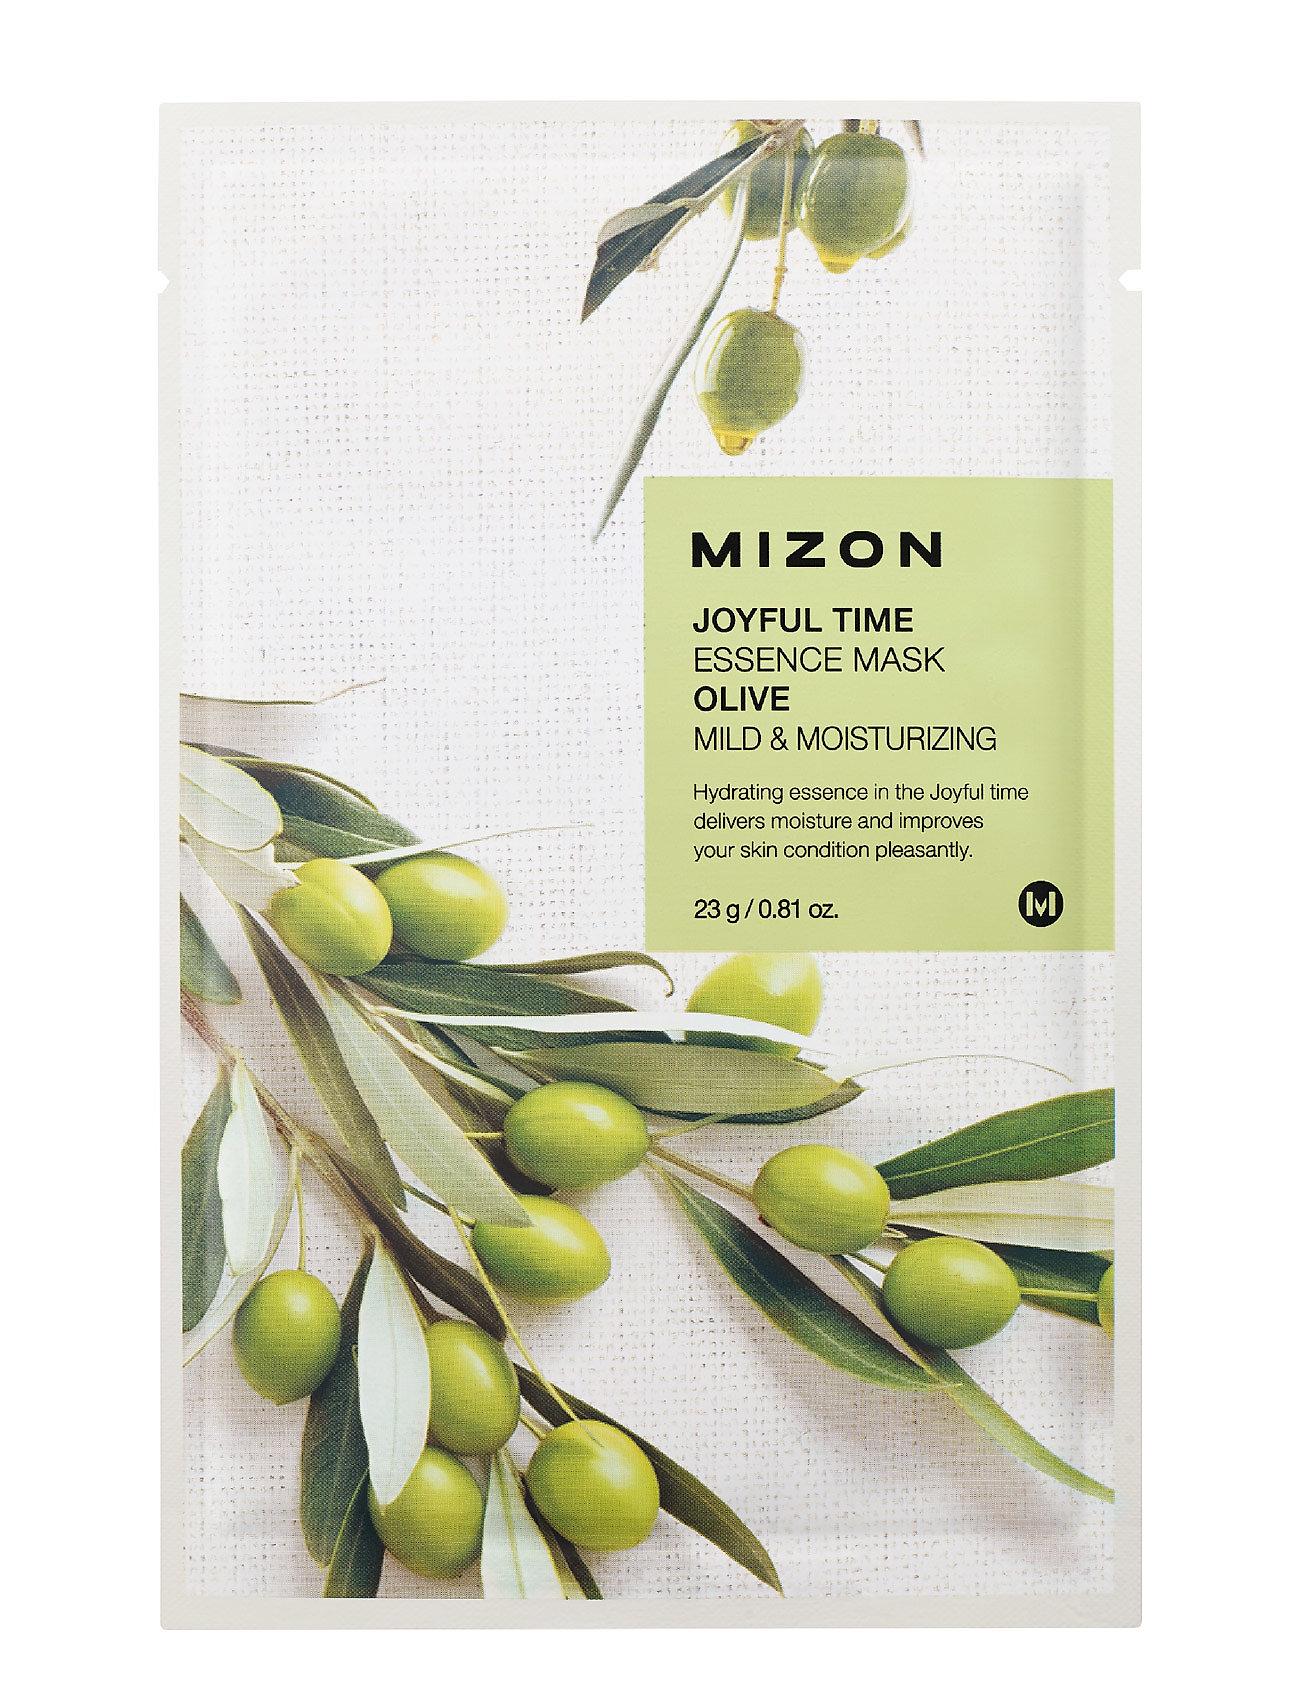 MIZON Joyful Time Mask Olive - CLEAR